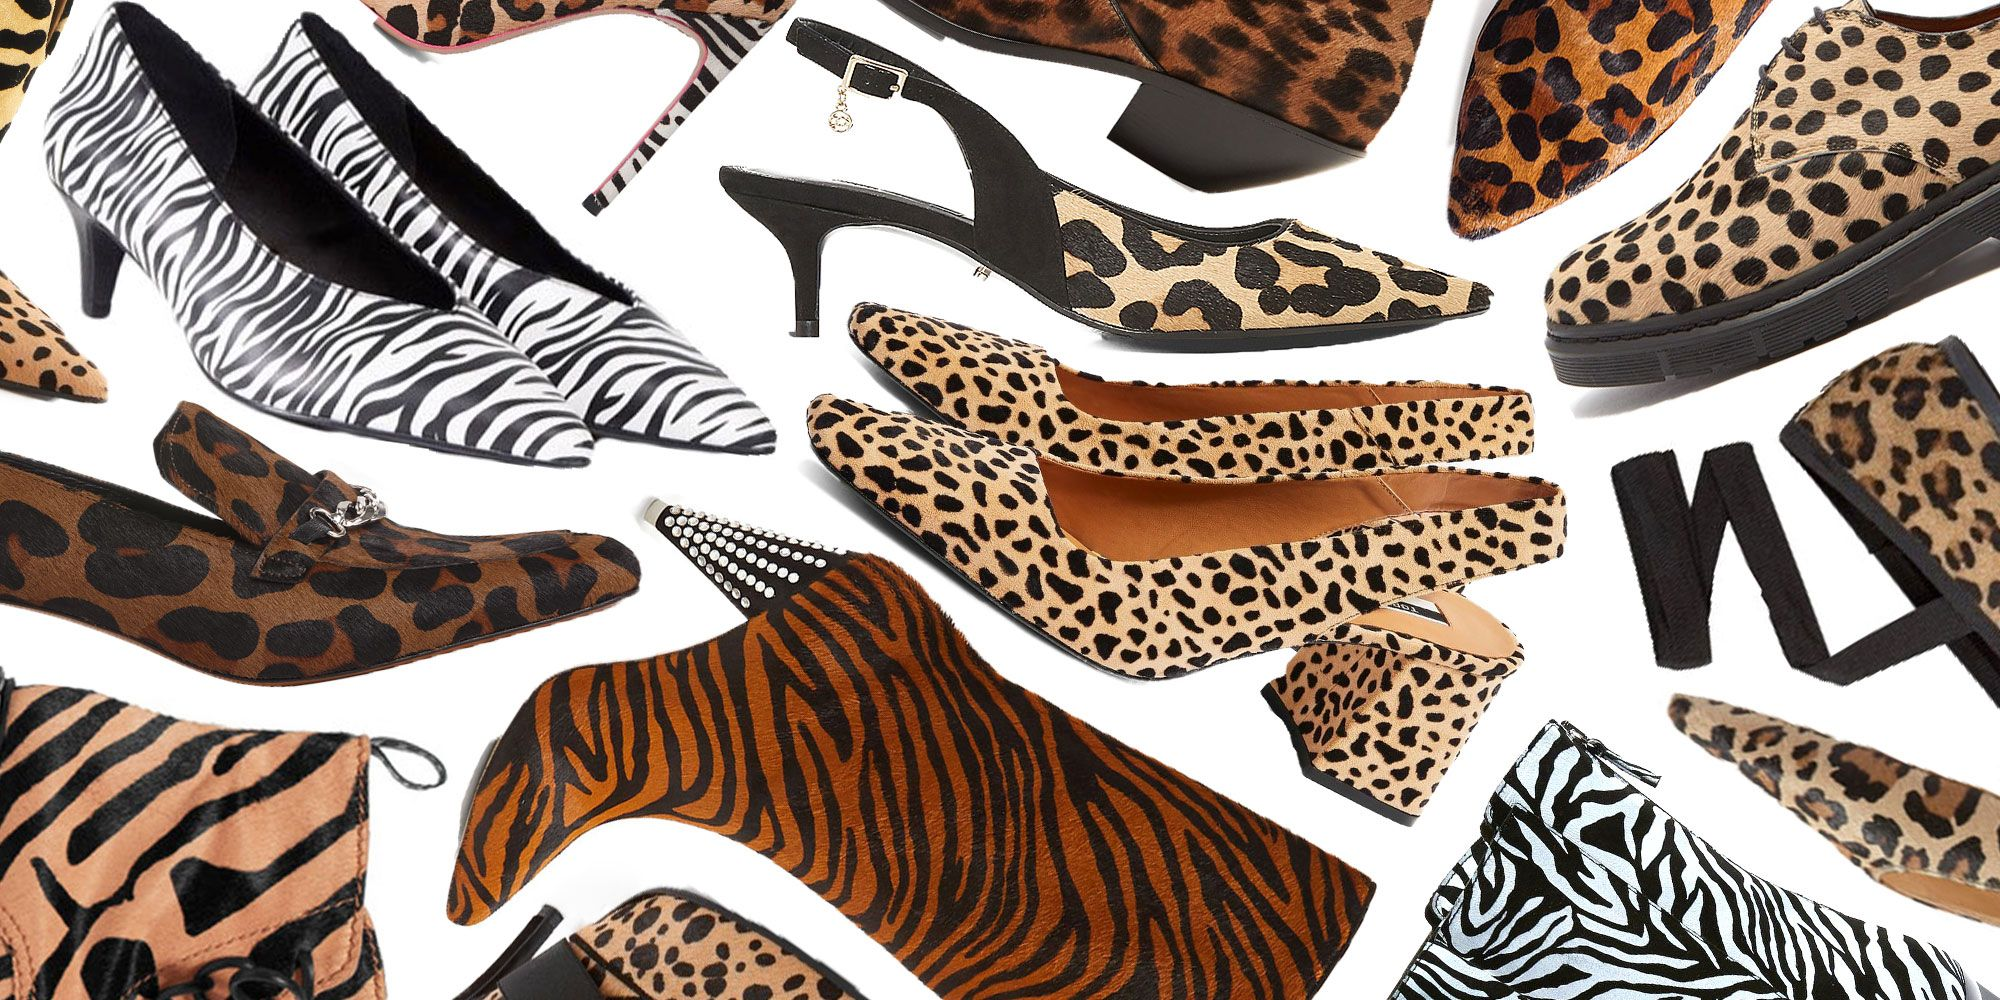 leopard print kitten heels - animal print shoes